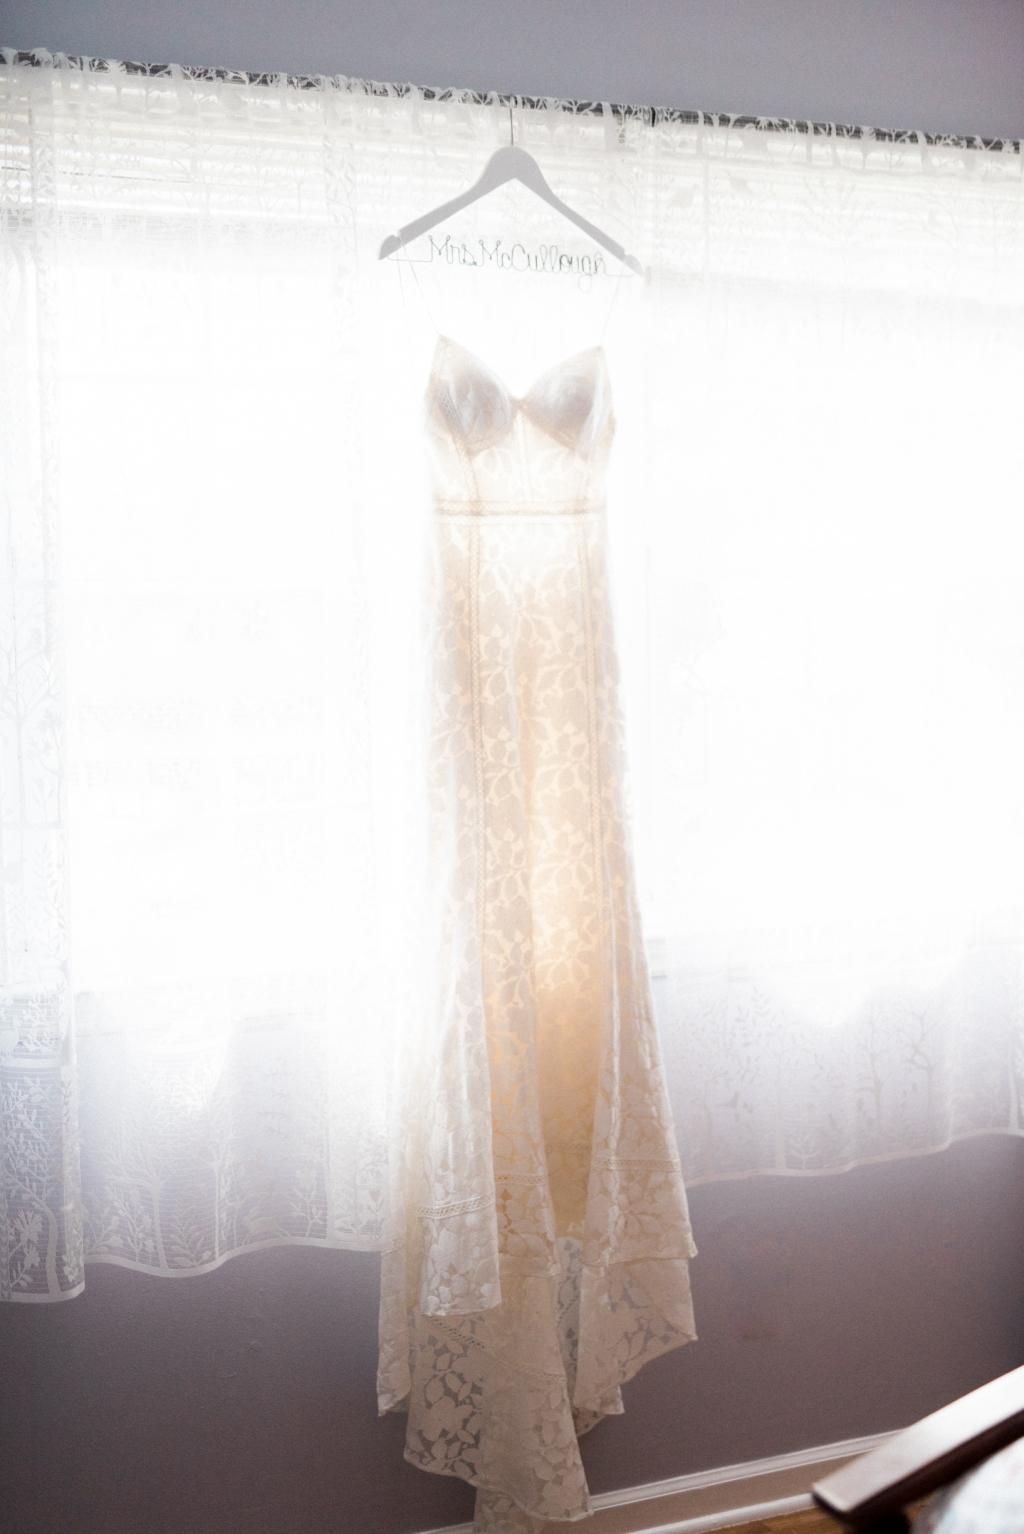 haley-richter-photography-buena-vista-confrence-center-wedding-summer-010